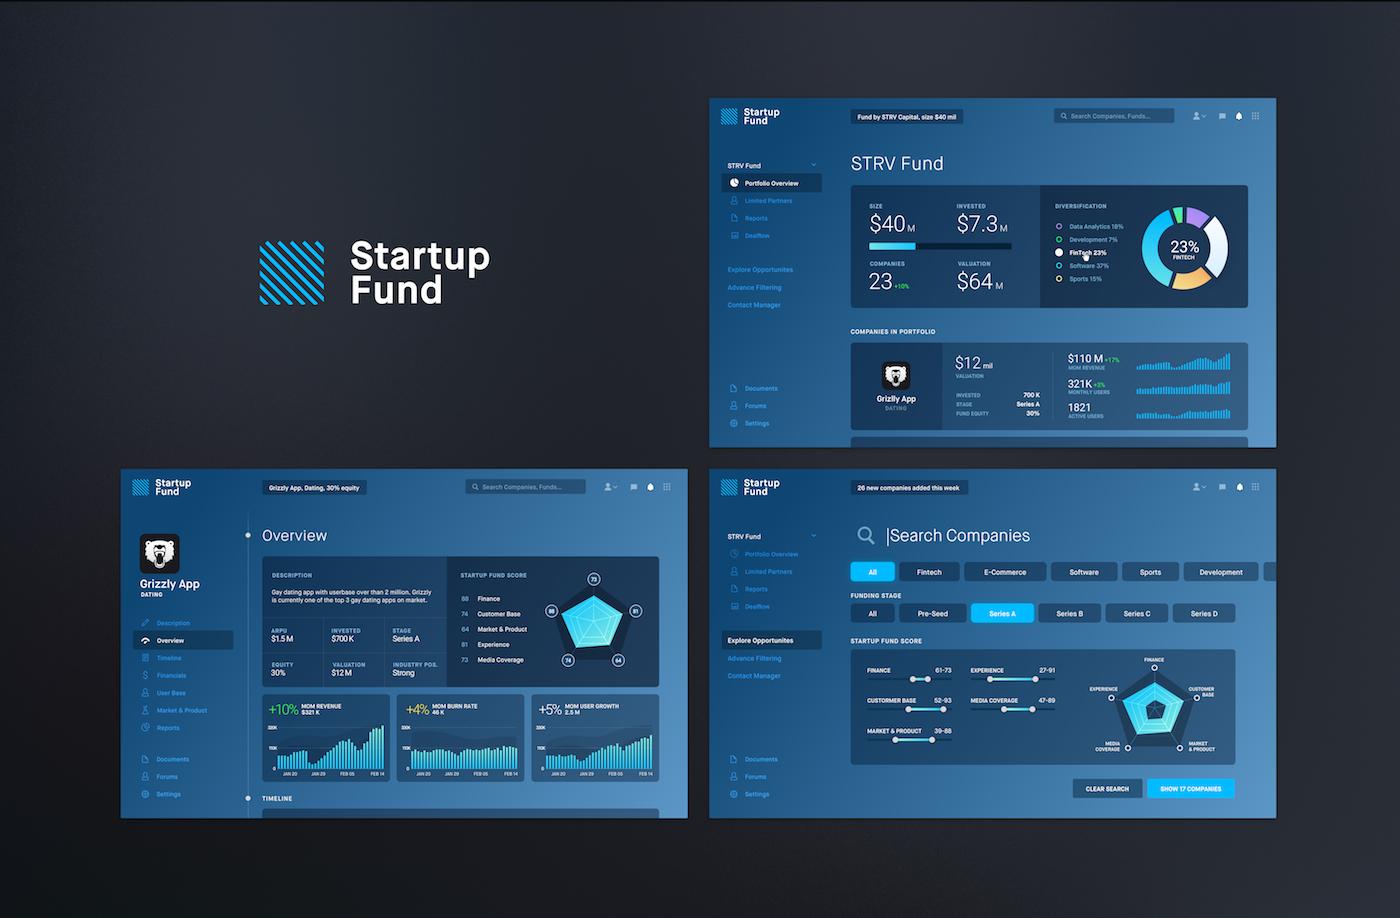 Startup Fund screens